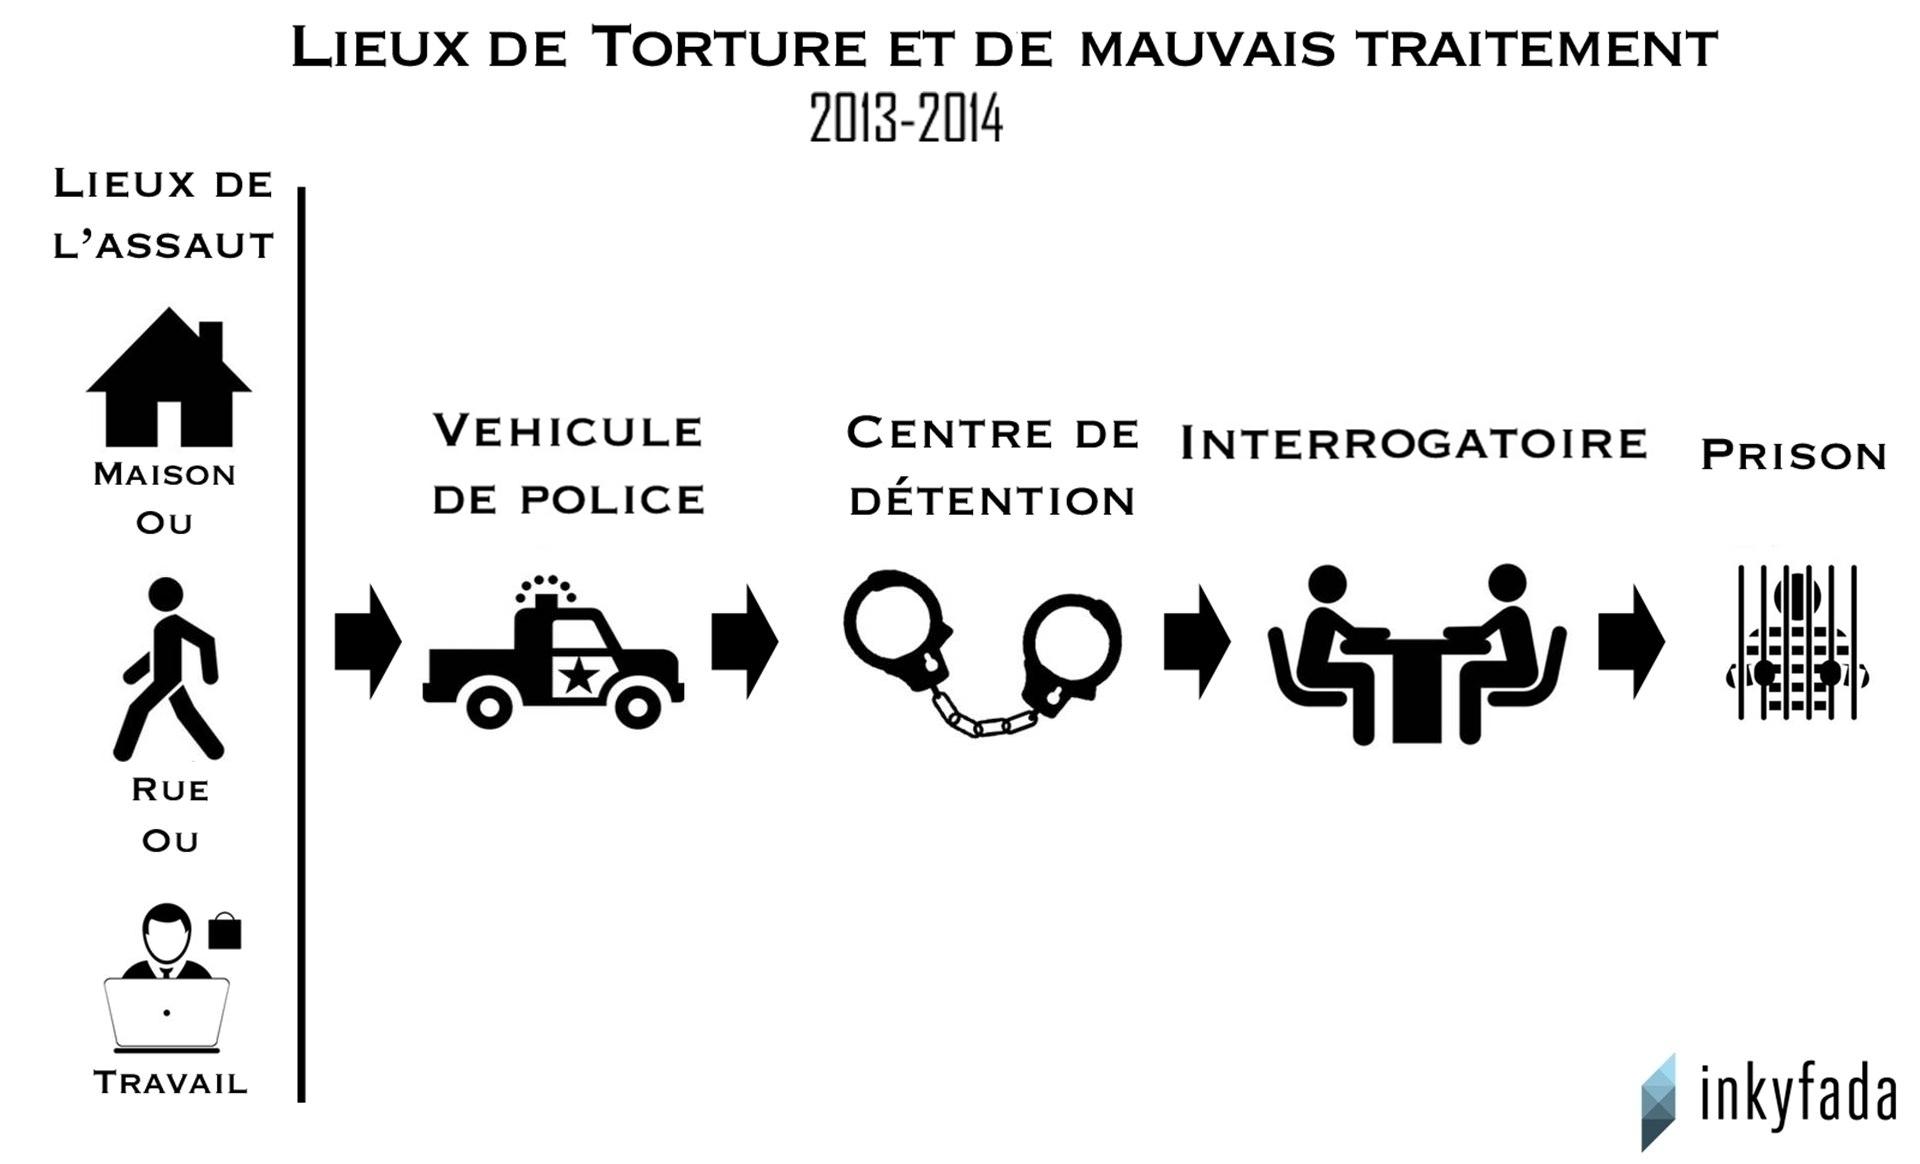 lieux-torture-police-1920-inkyfada.jpg